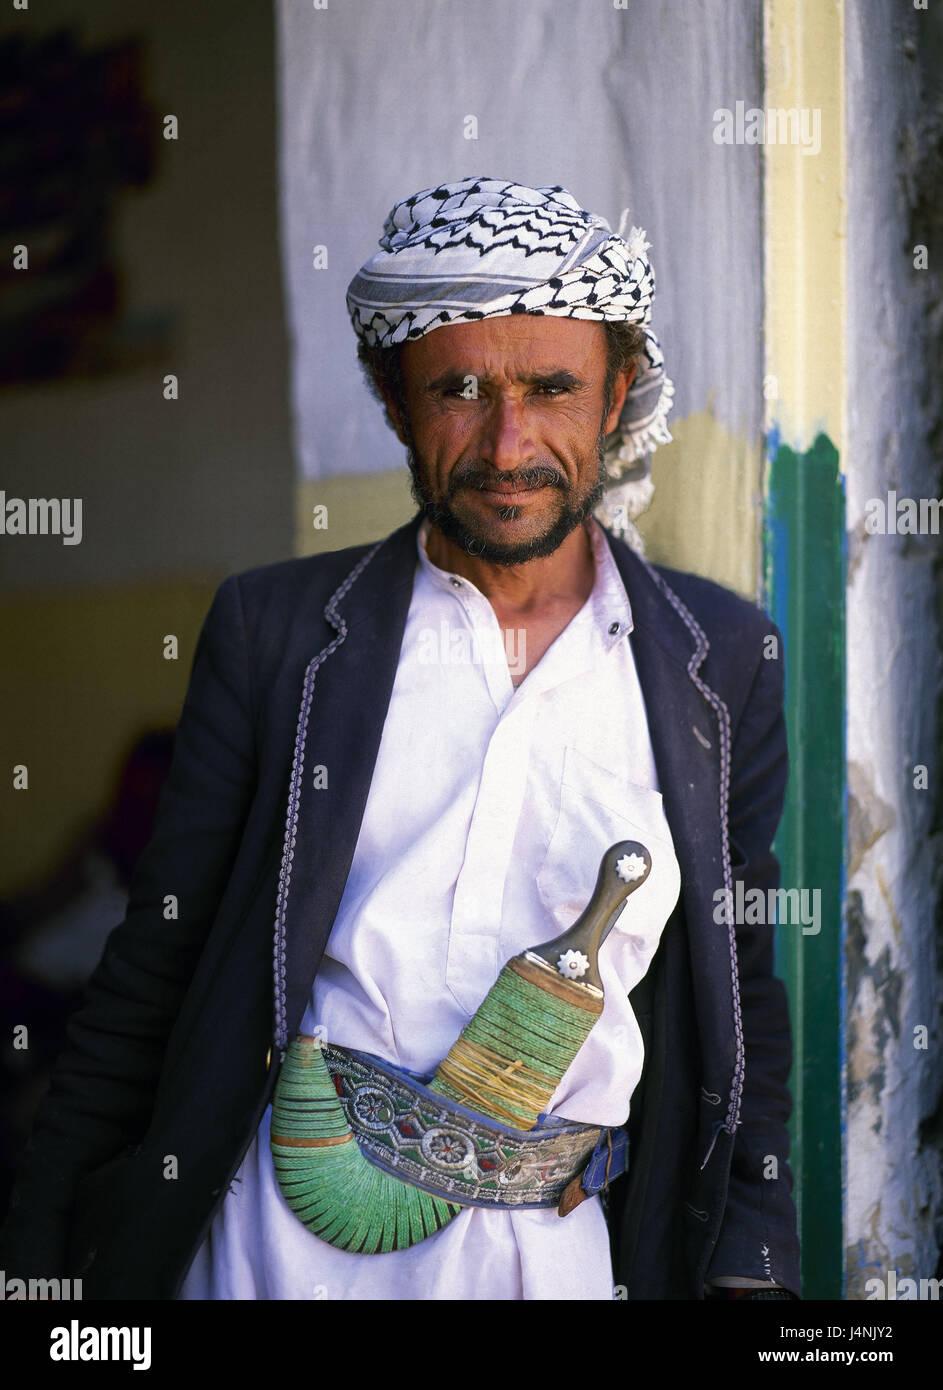 Yemen, Sanaa, man, crooked dagger, half portrait, the Near East, capital, Yemen, East, local, person, Arab, Yemeni, - Stock Image